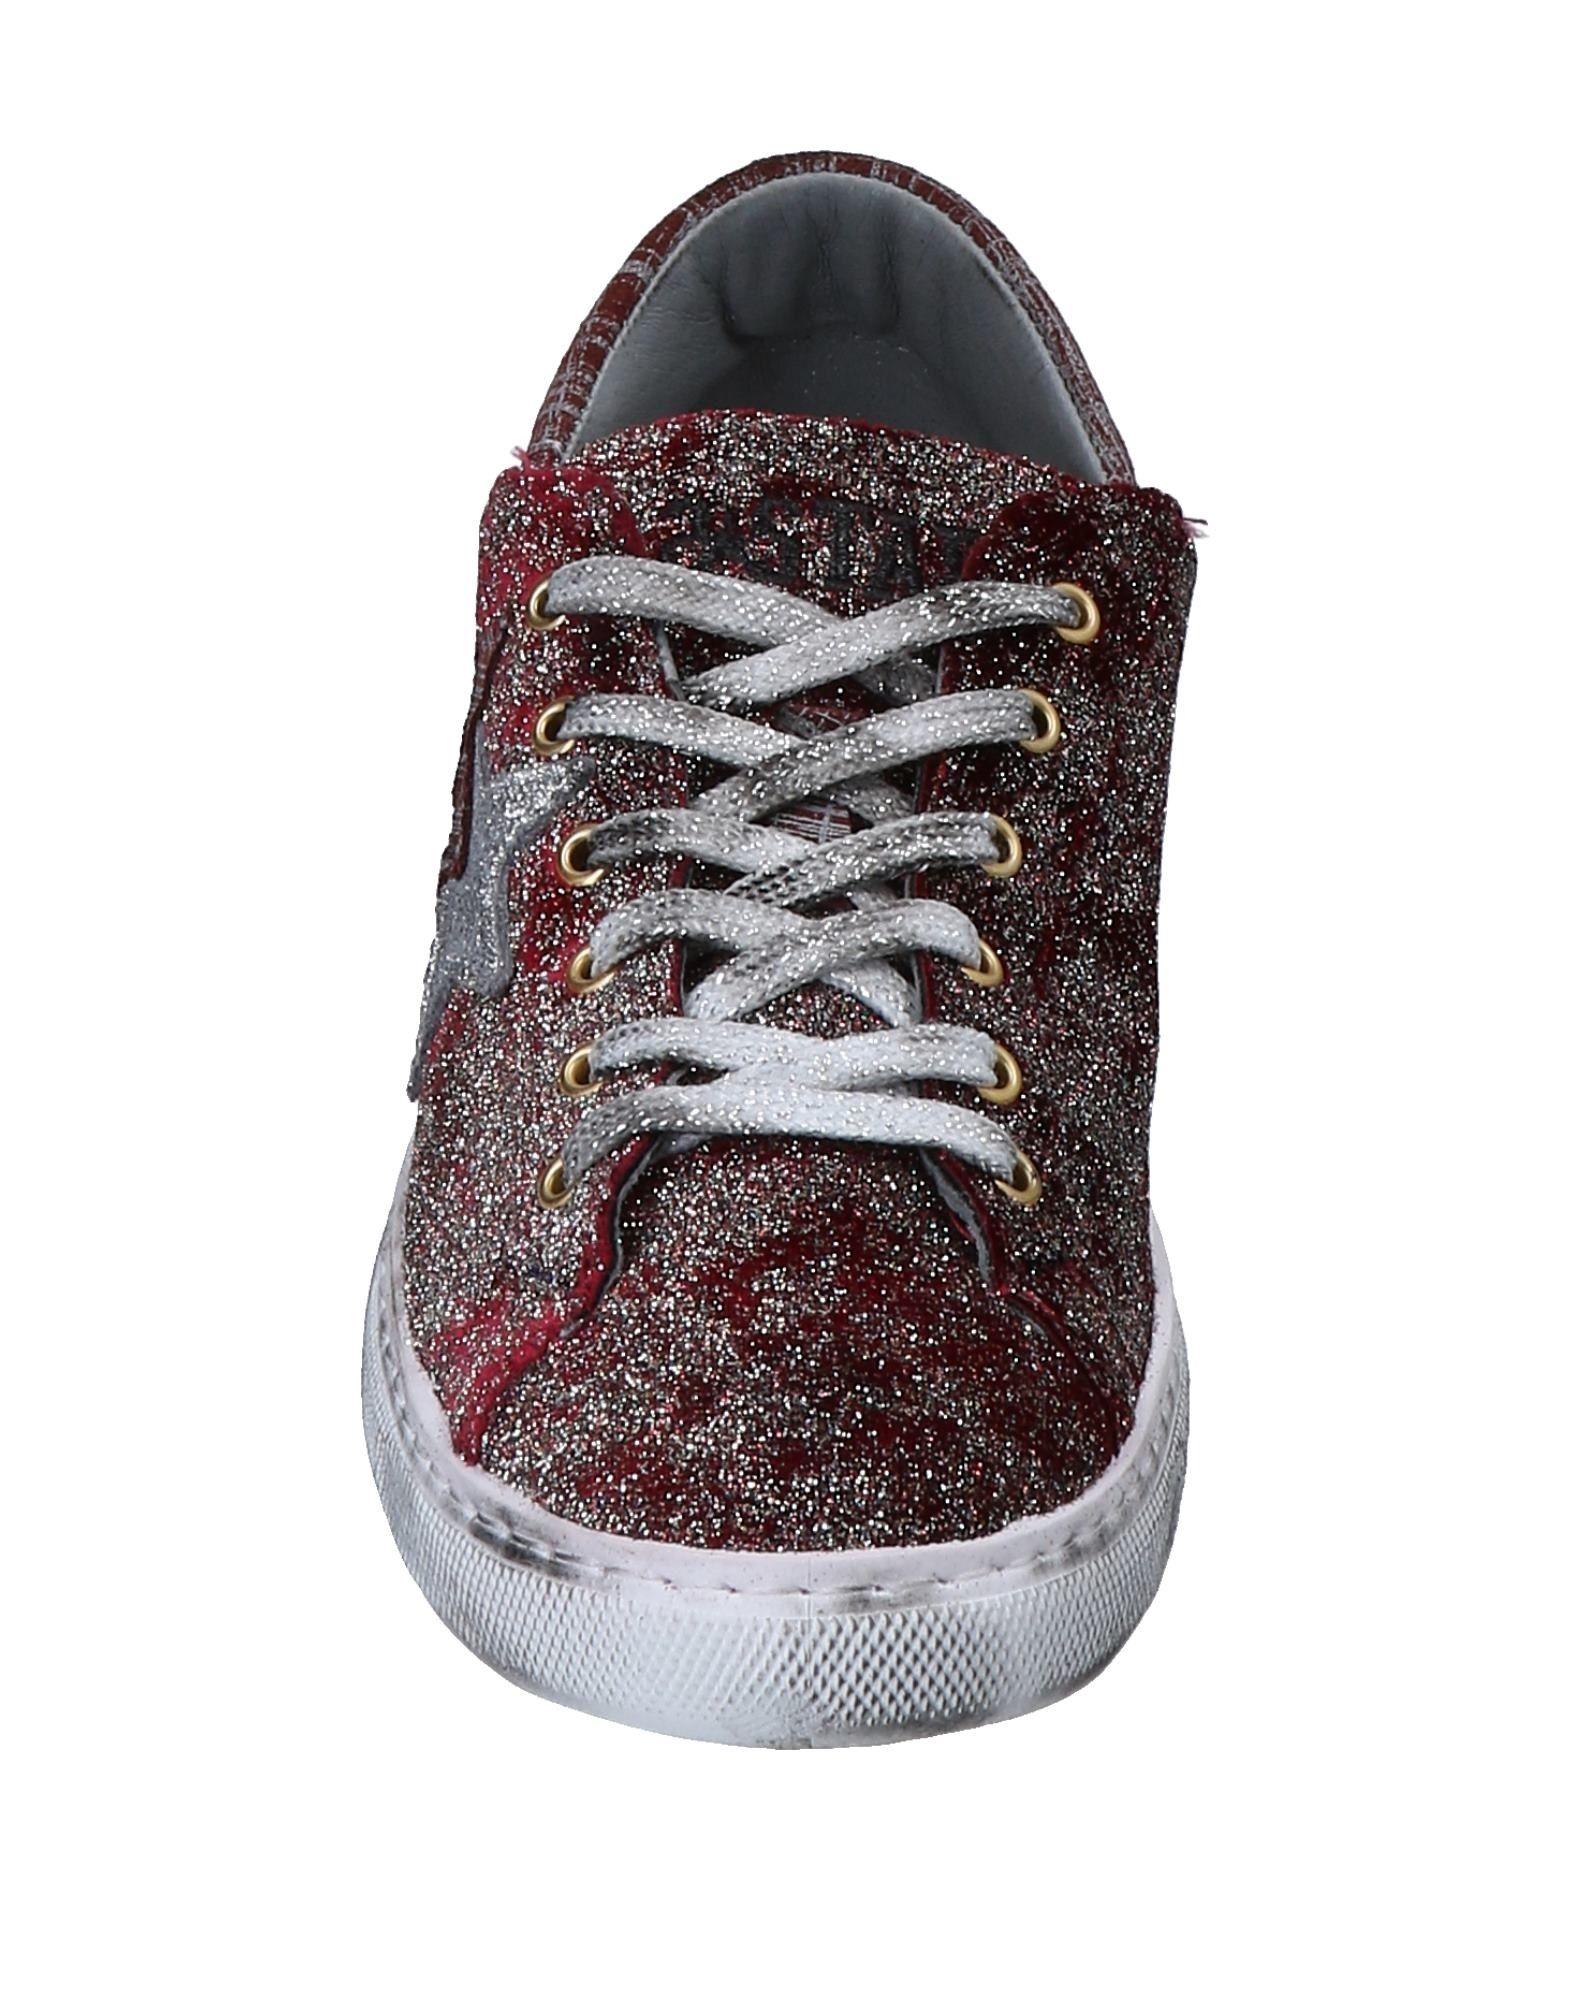 2Star Sneakers Damen Damen Sneakers  11552187VH  70f692